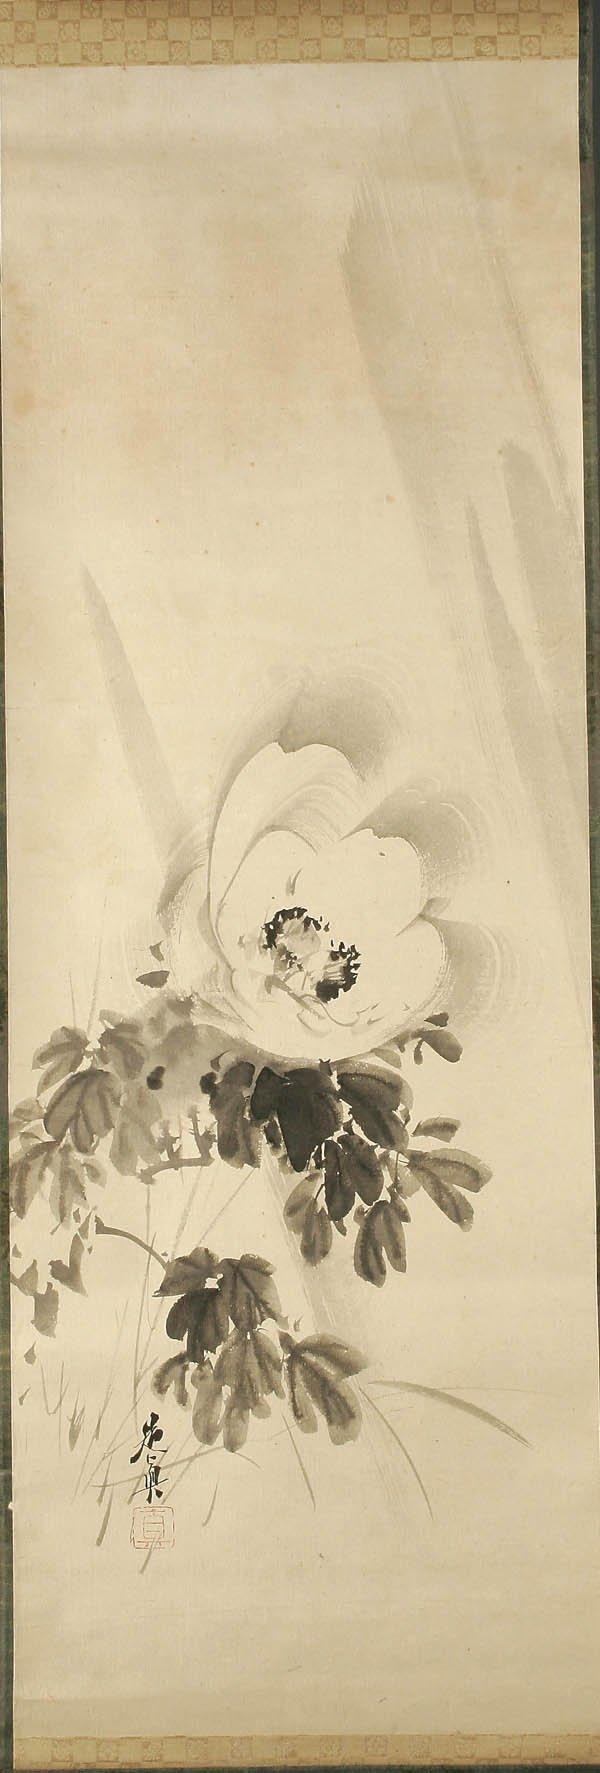 "751: SHIBATA ZESHIN (Japanese 1807-1891) ""Peony"" ink o"